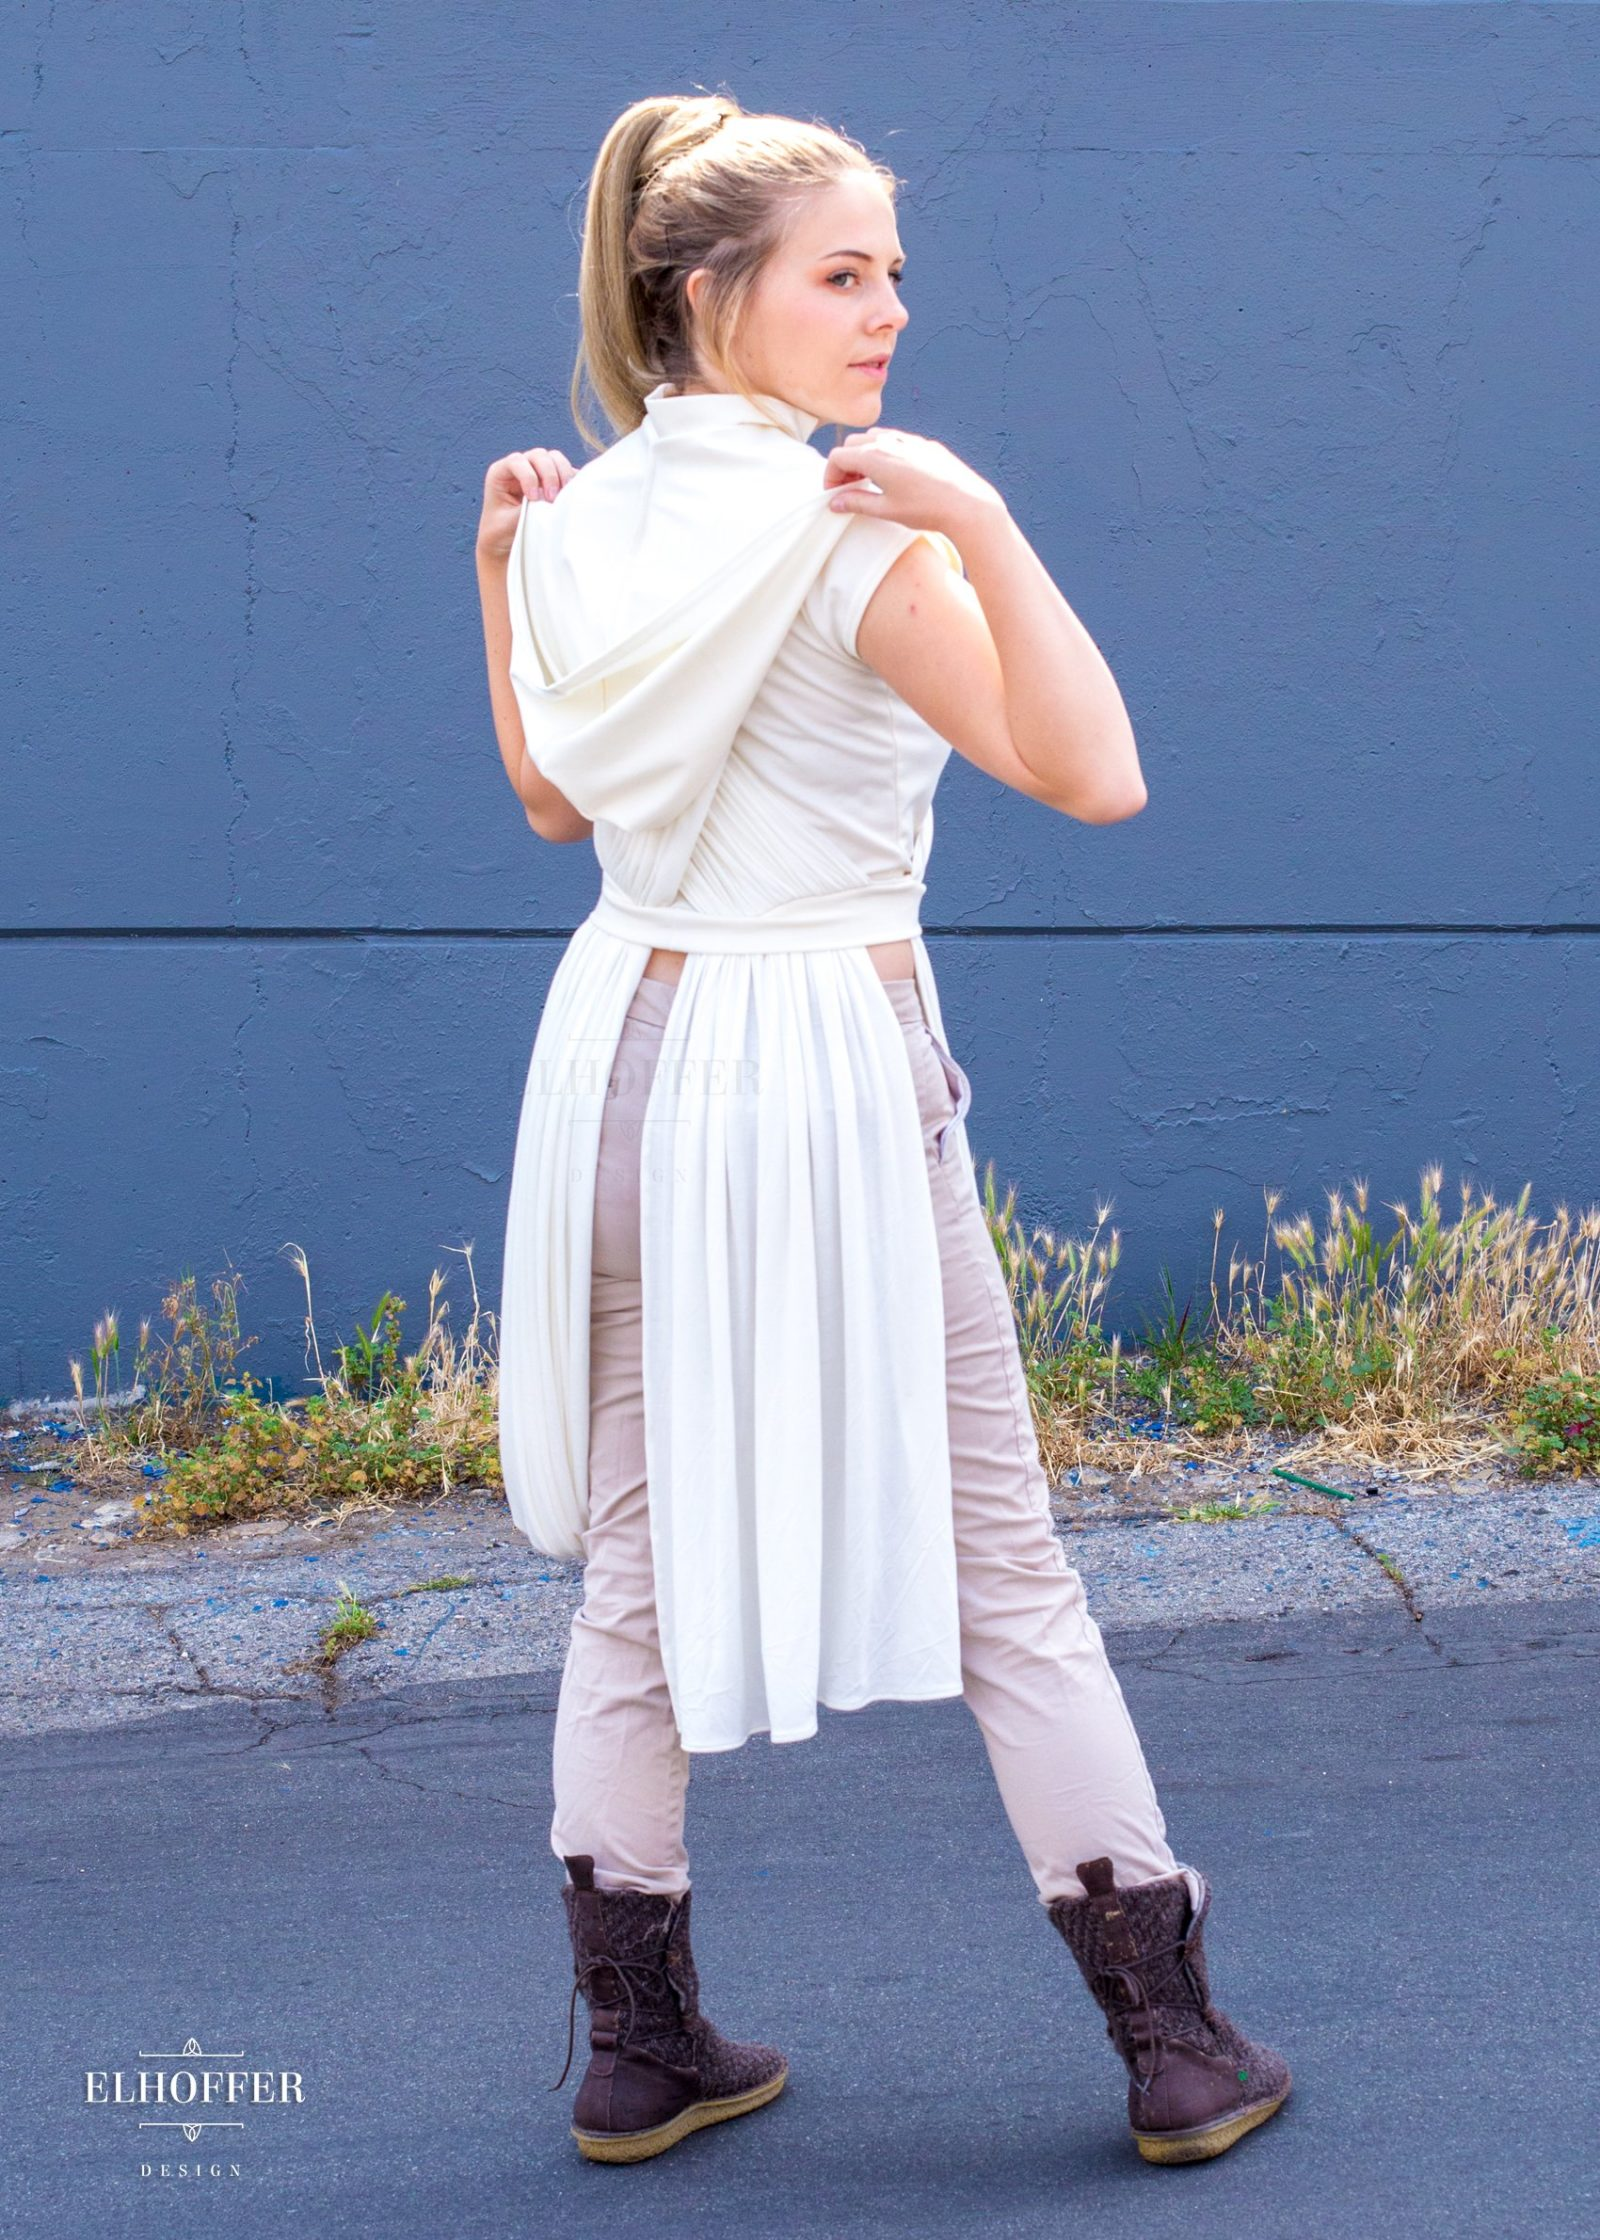 Elhoffer Design - Star Wars Rey Inspired Galactic Scavenger Hooded Top